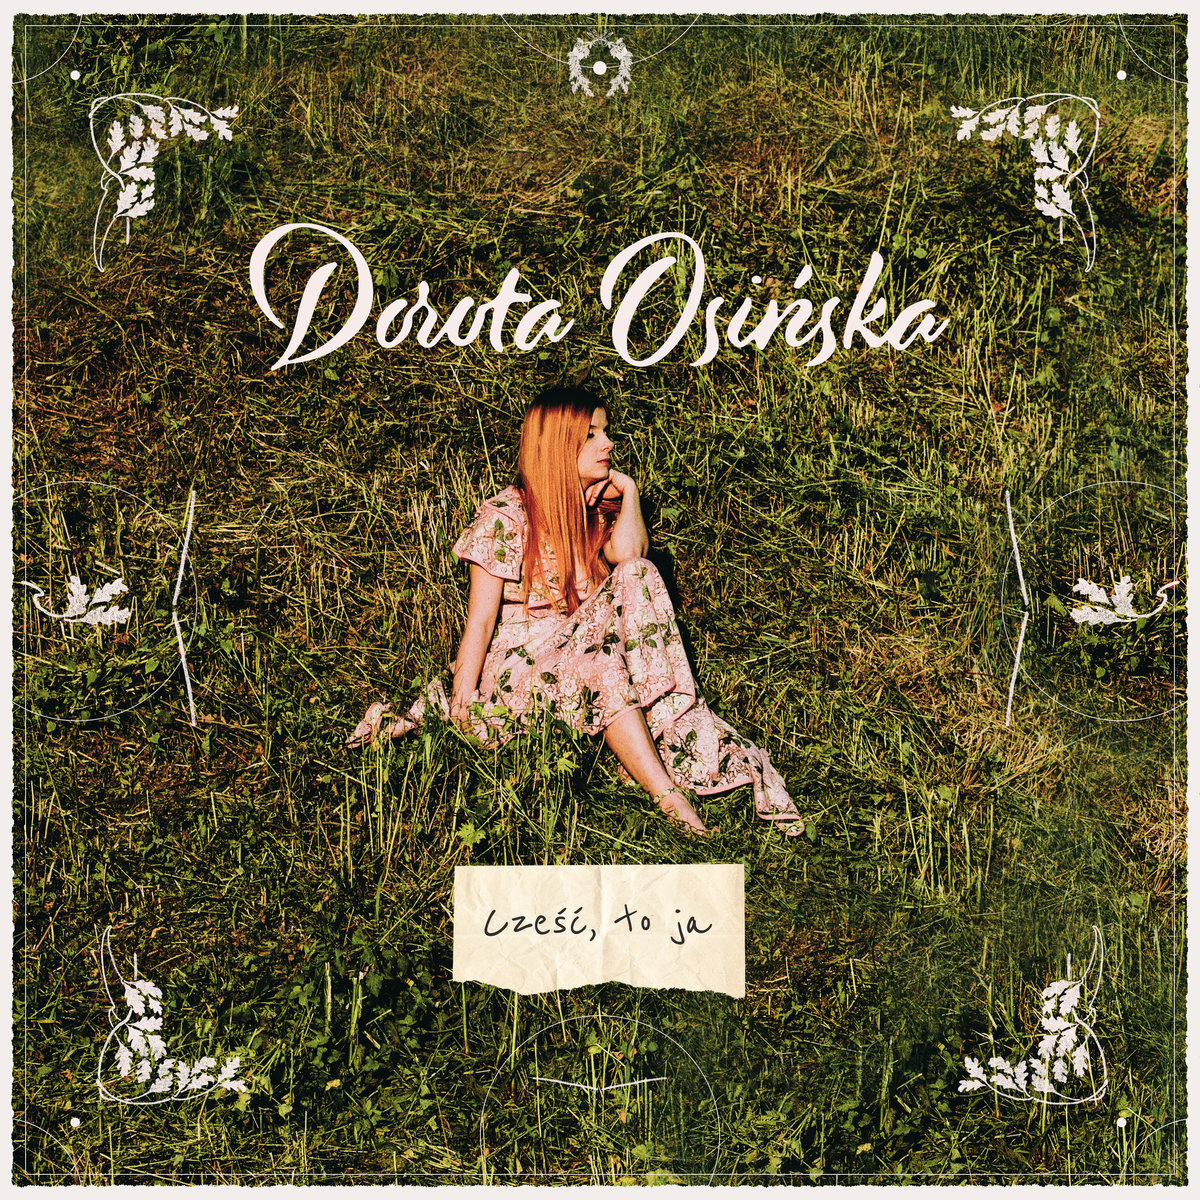 Dorota Osińska - Cześć, to ja